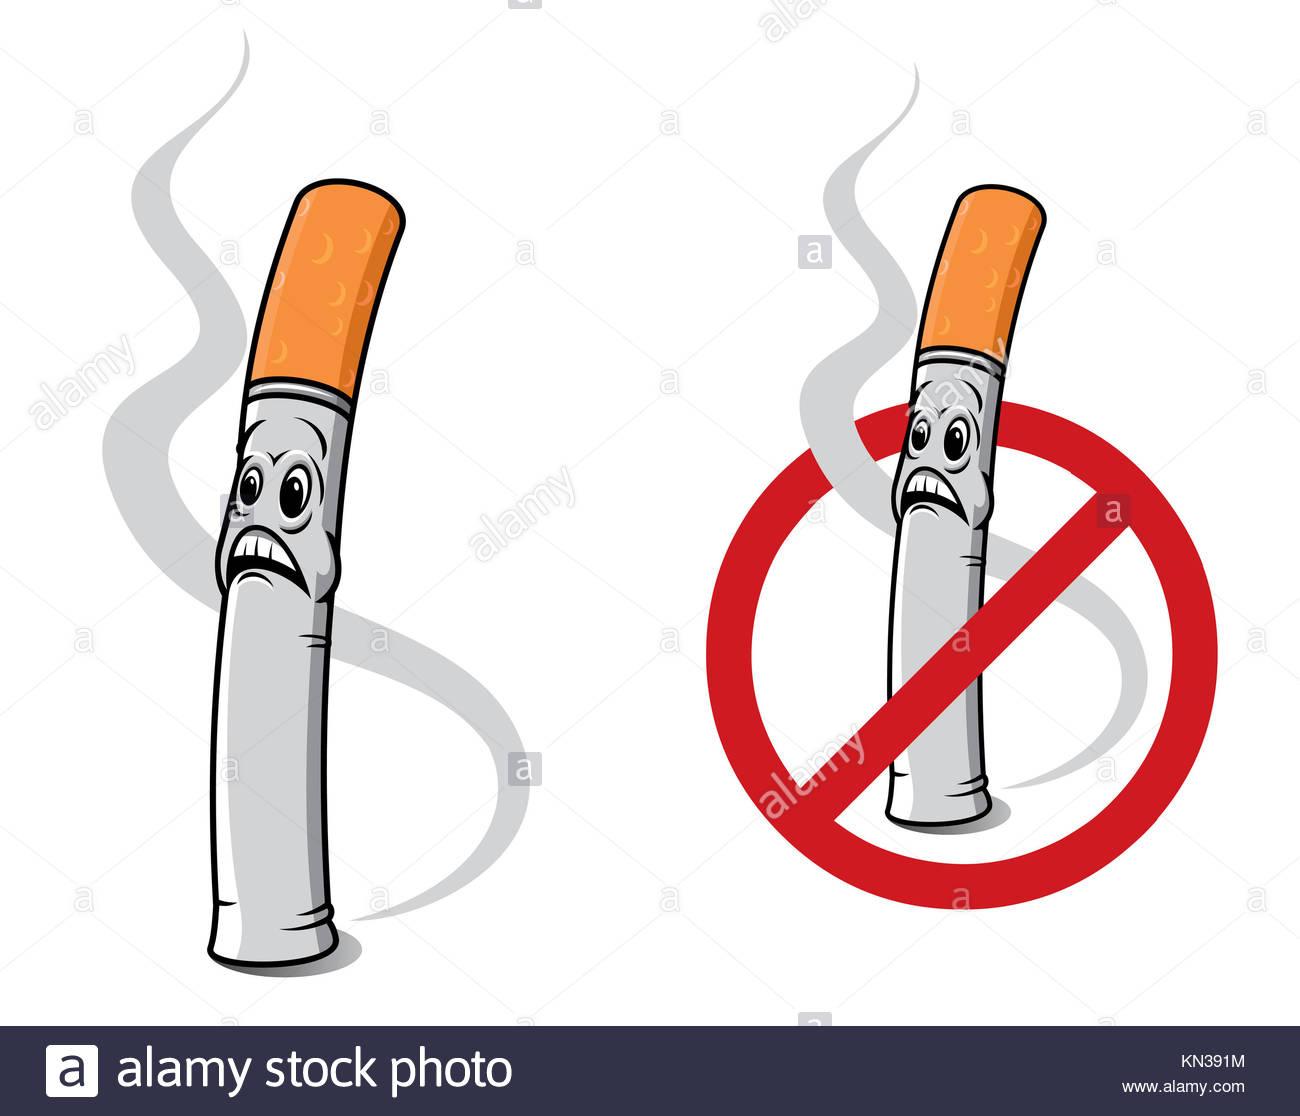 Cigarette Caricature caricature de l'interdiction de fumer la cigarette pour signer